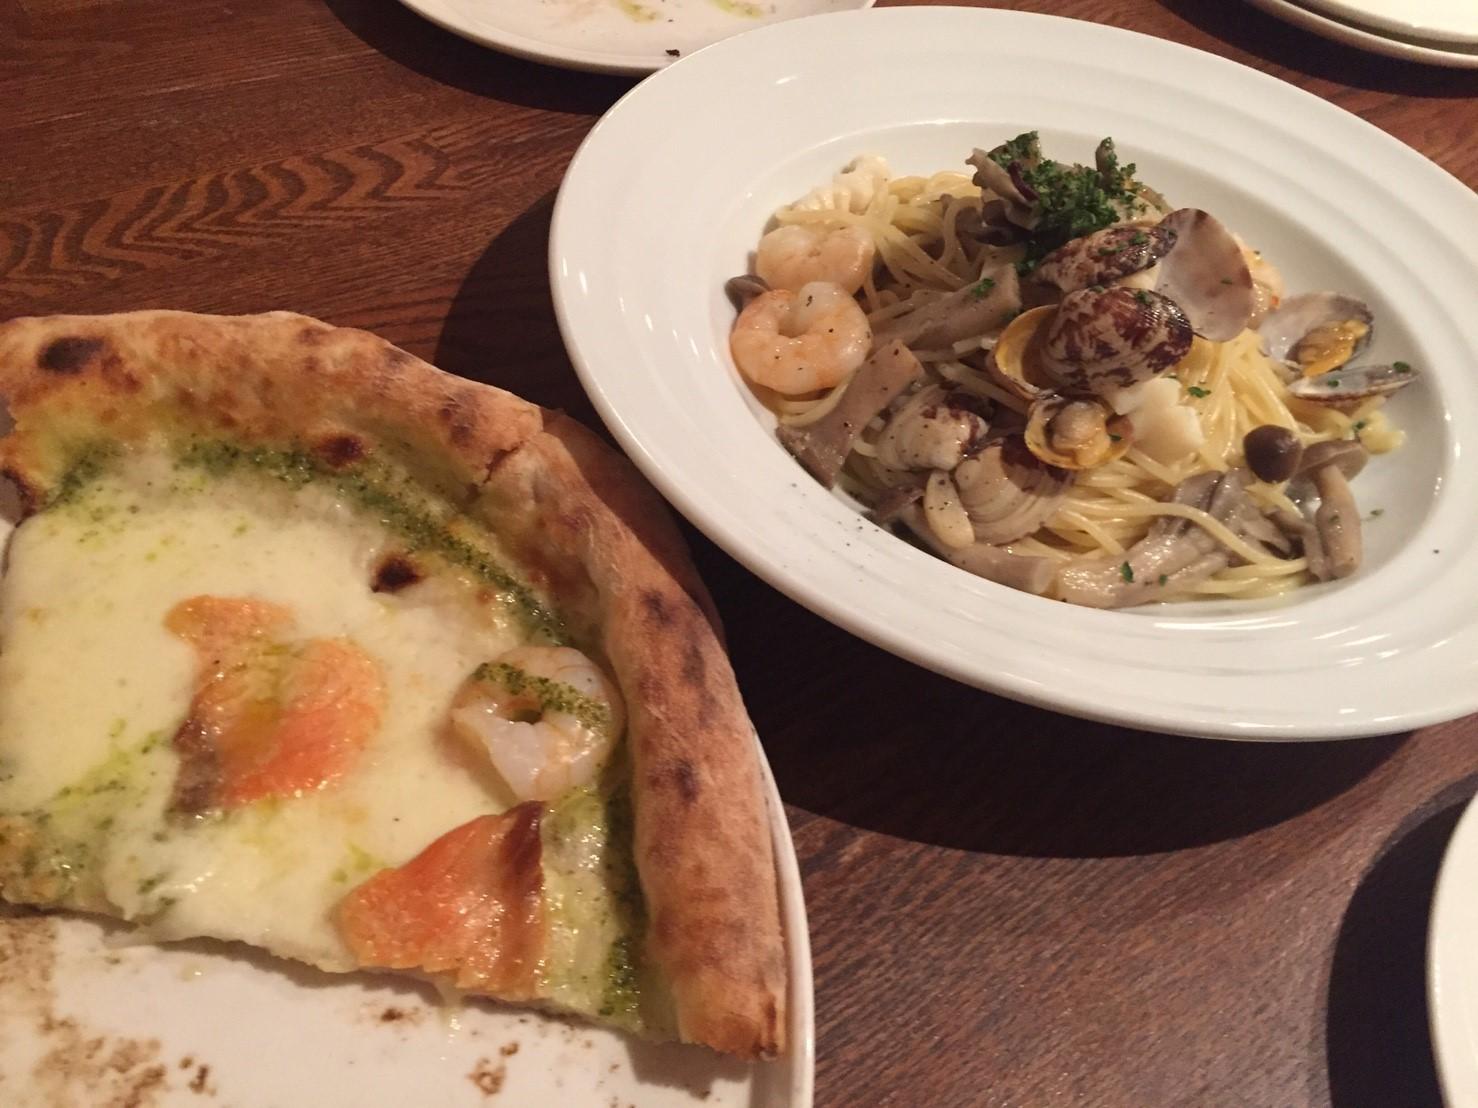 Pizzeria Sanare 取り分けディナー_e0115904_05530274.jpg